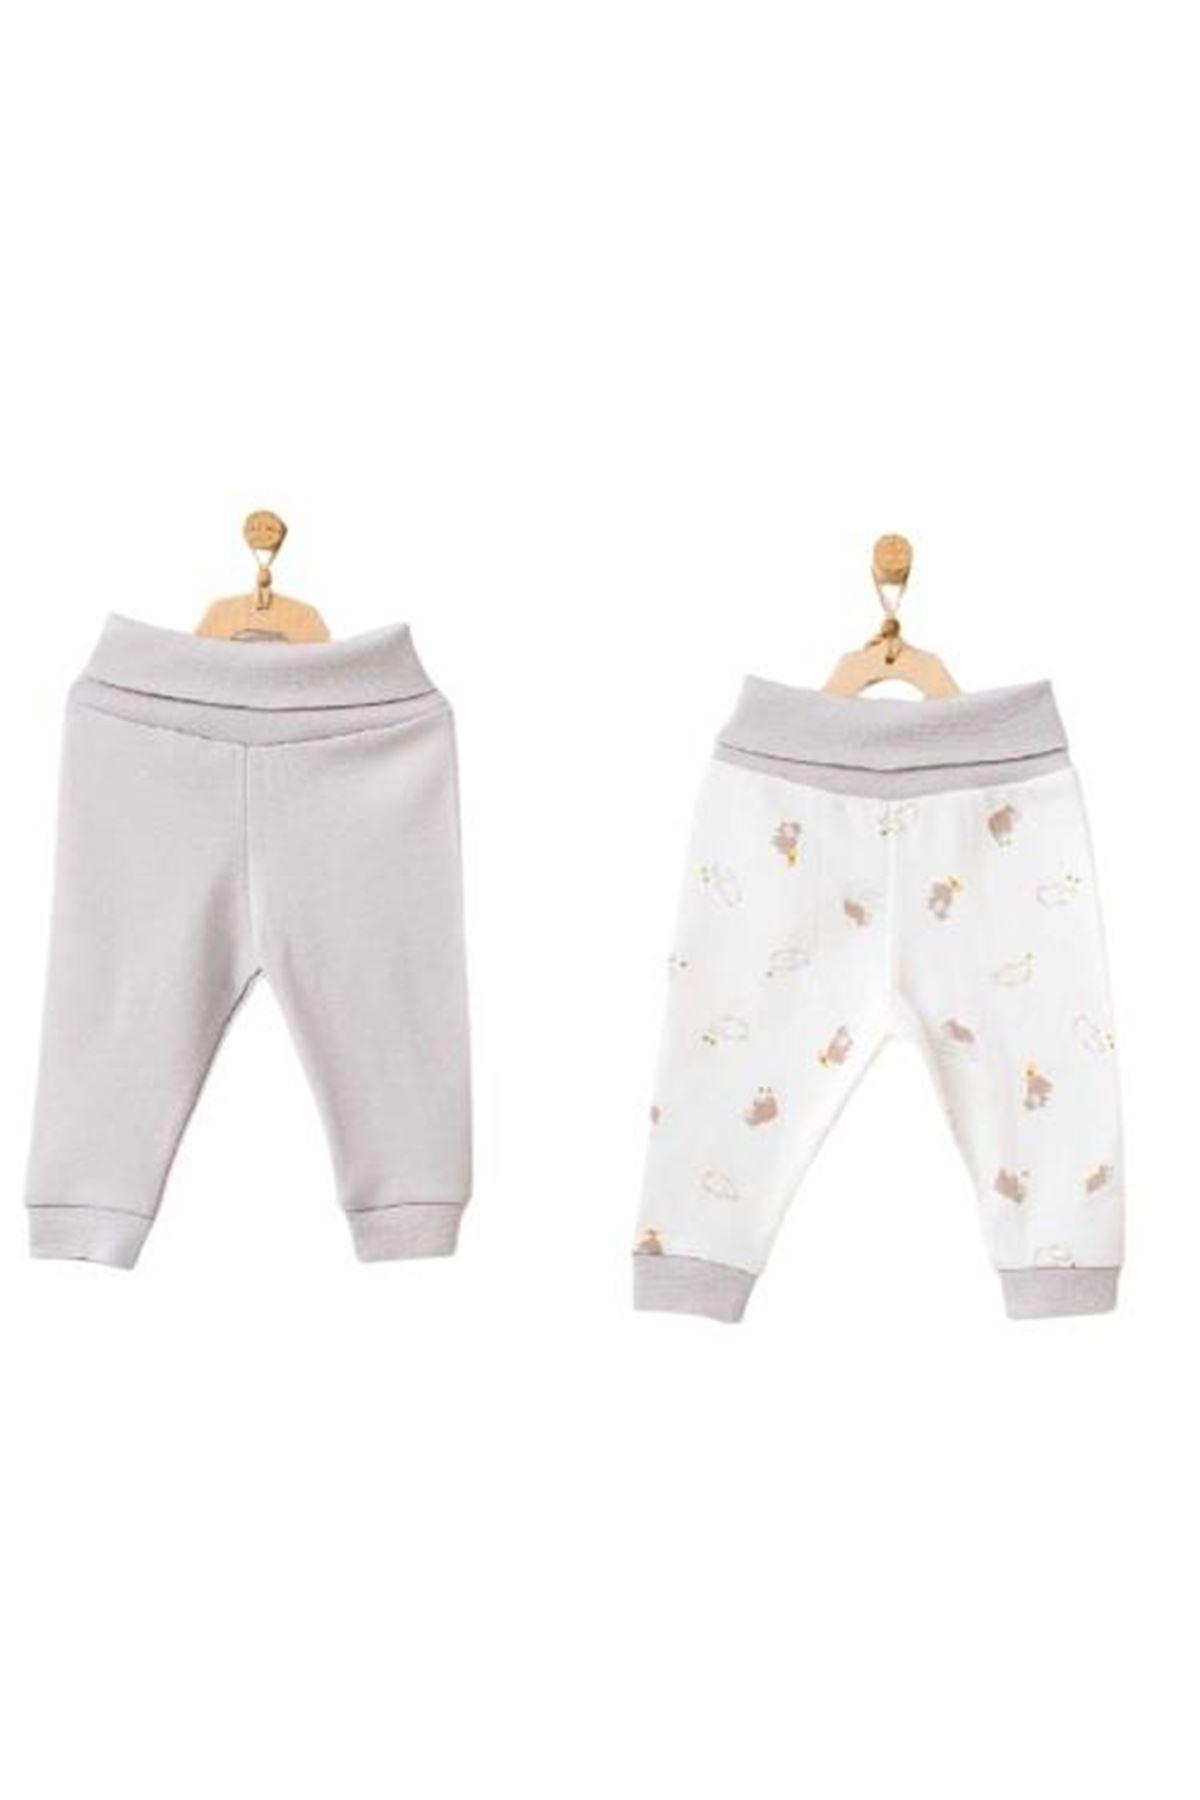 Andywawa AC21764 Hippo 2li Pantolon Grey